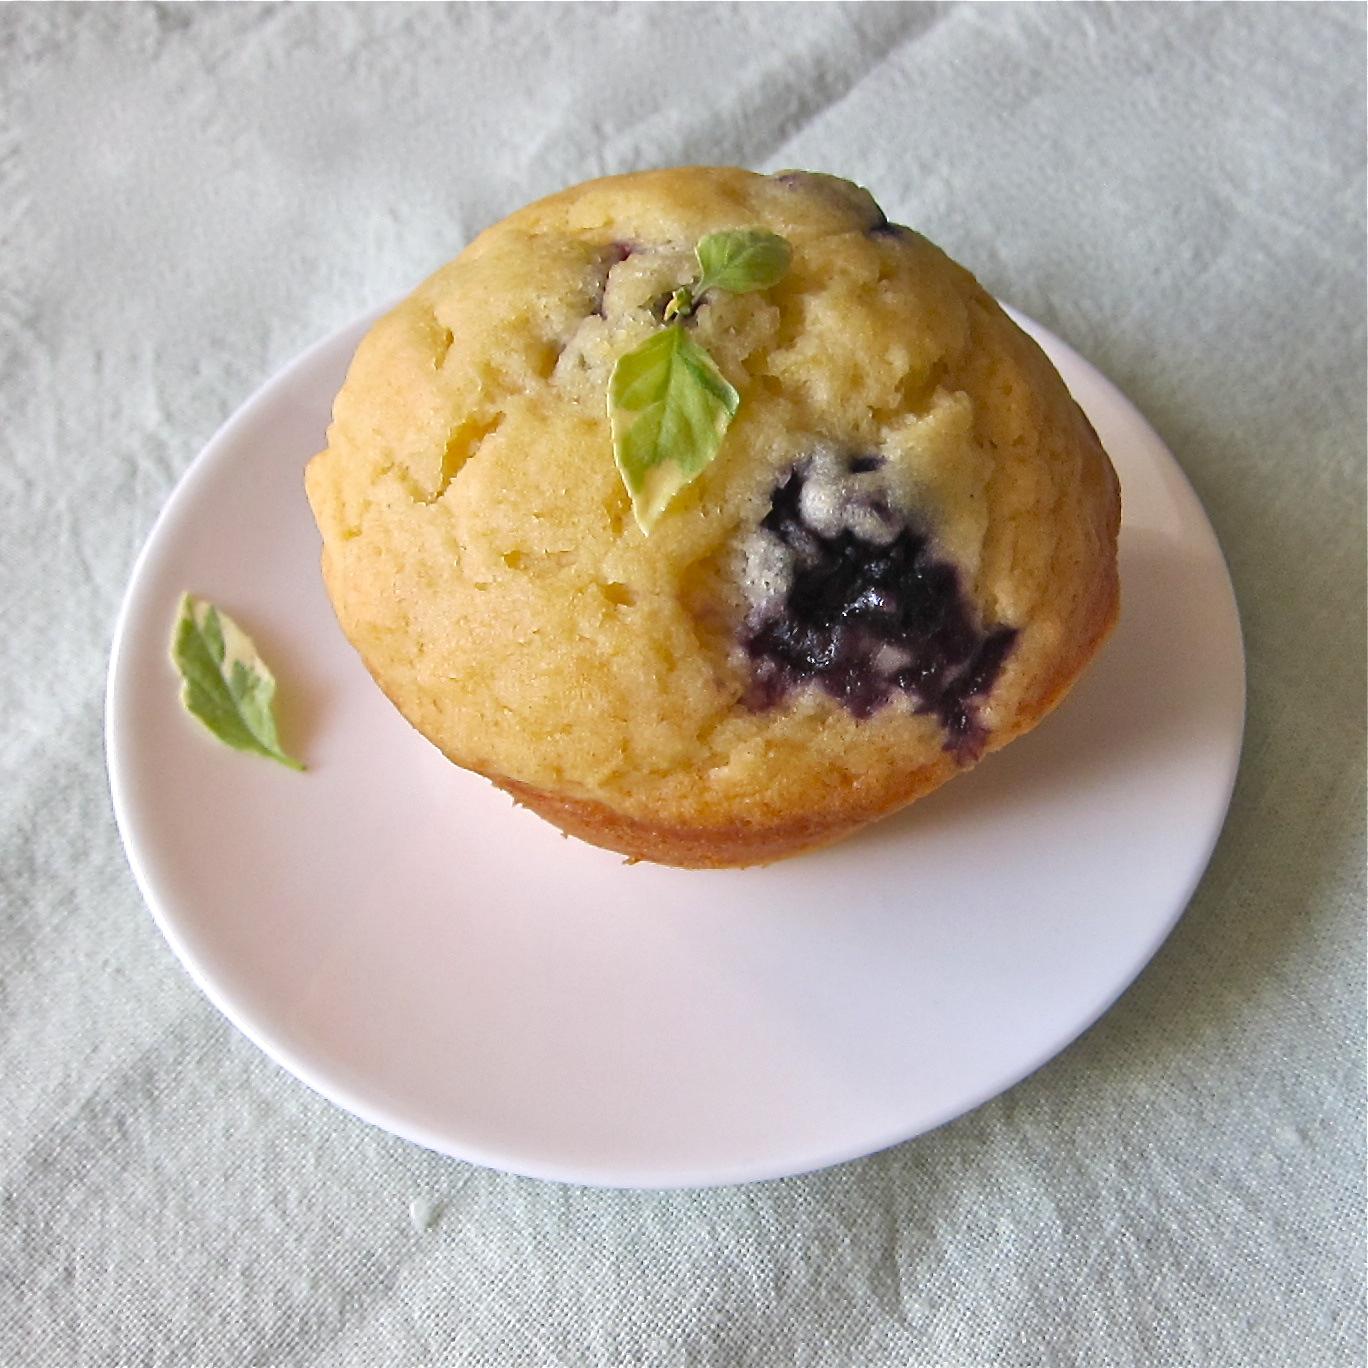 Lemon Blueberry Basil Muffins